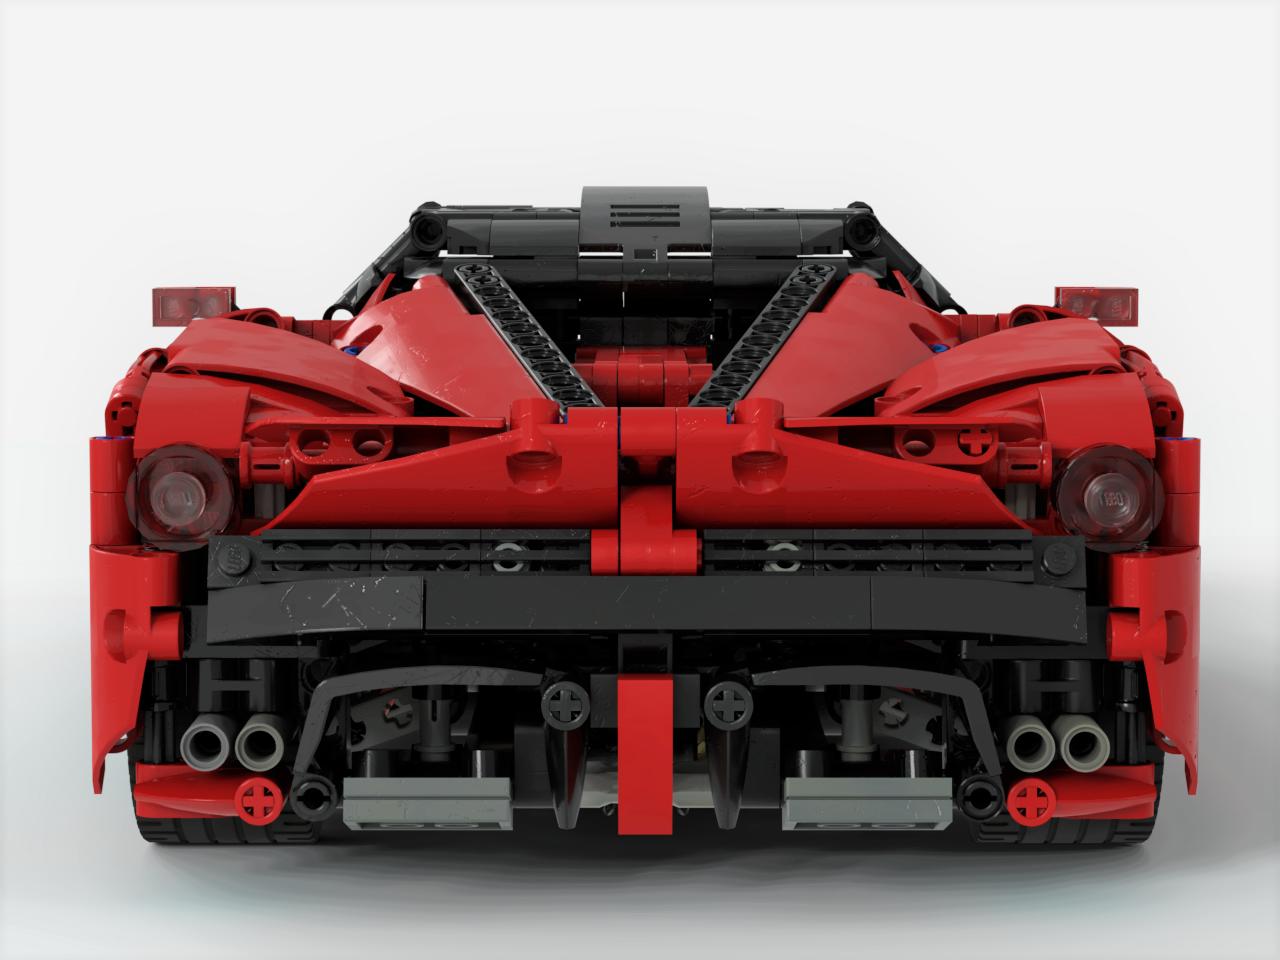 Ferrari%20Laferrari%20rear.png